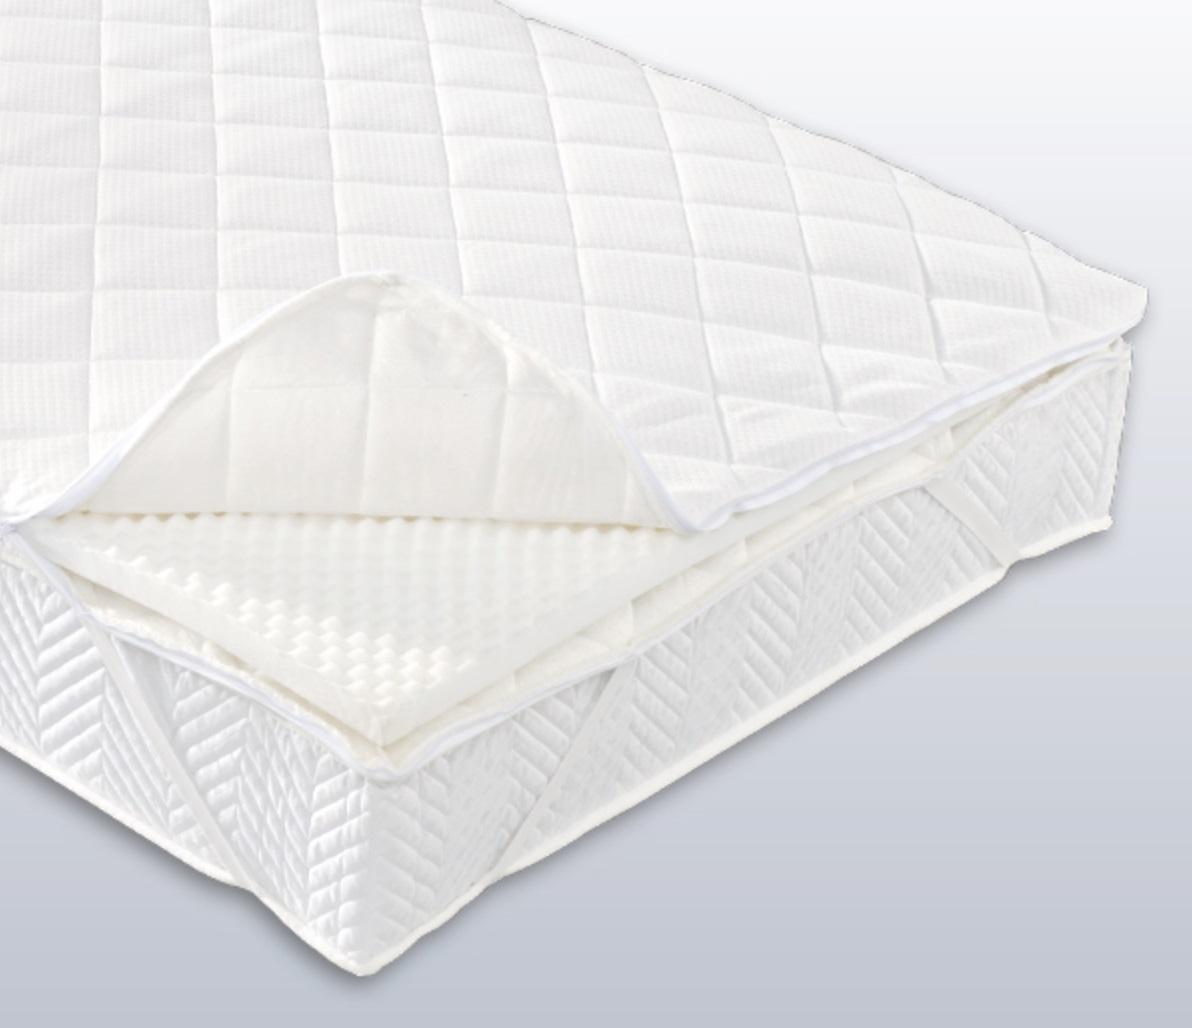 matratzen topper wellness matratzenzubeh r bettenzubeh r betten. Black Bedroom Furniture Sets. Home Design Ideas